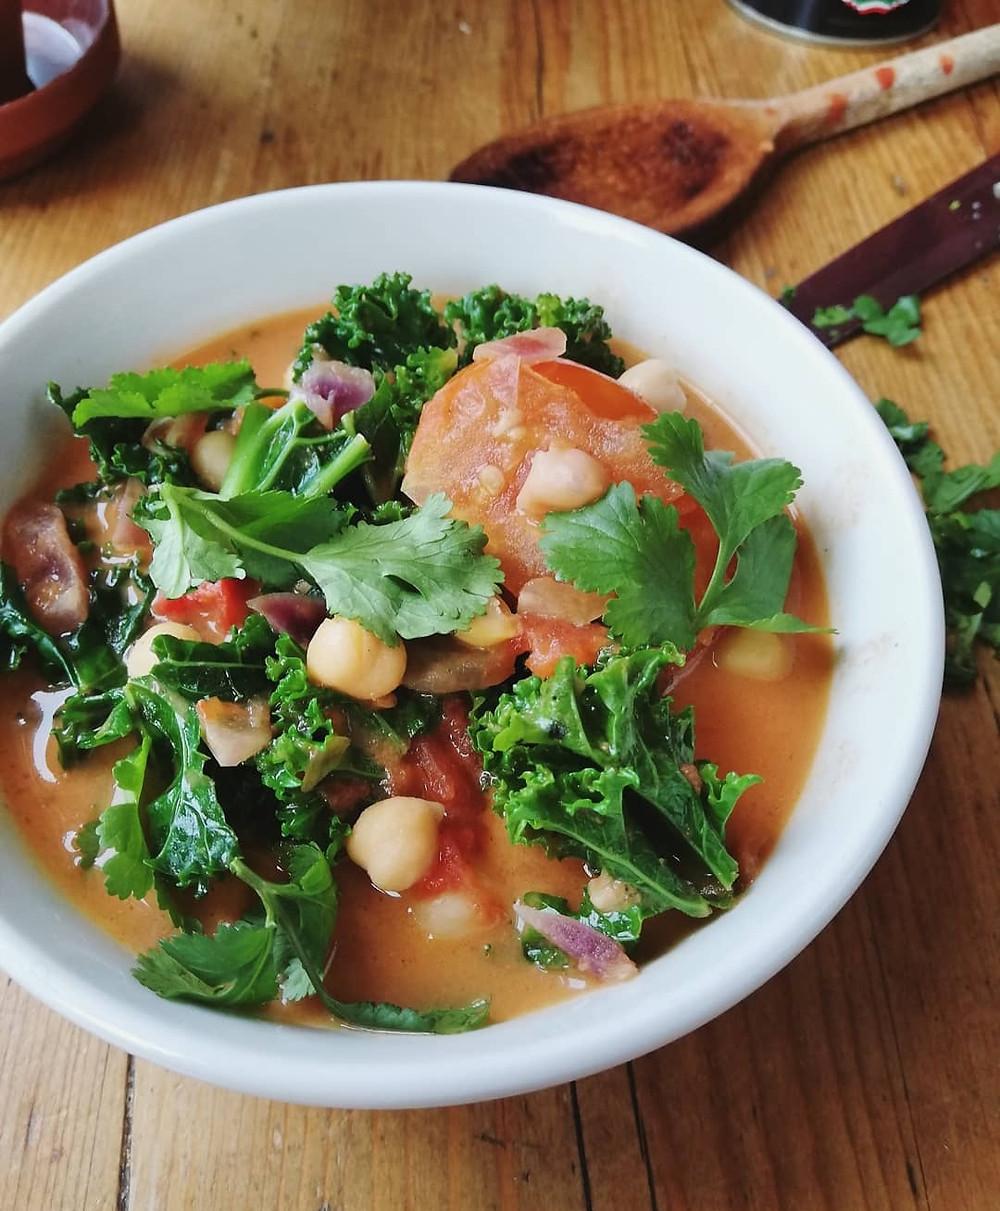 Chickpea, Kale & Coconut Spiced Soup